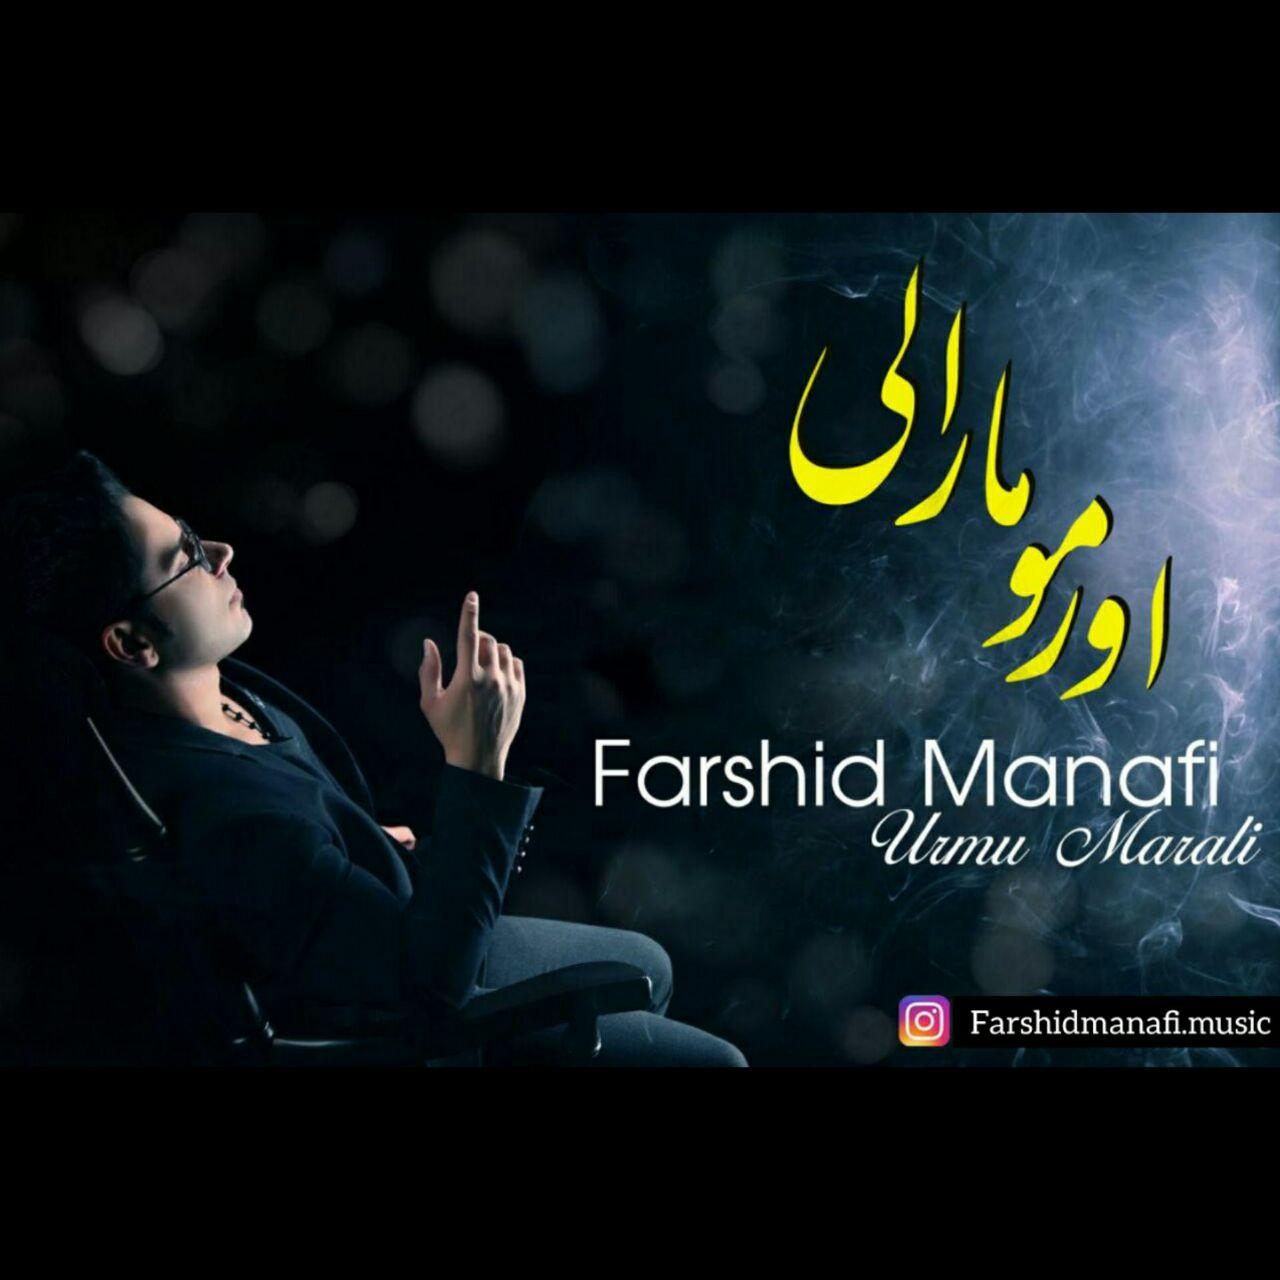 http://s9.picofile.com/file/8361502626/11Farshid_Manafi_Urmu_Marali.jpg